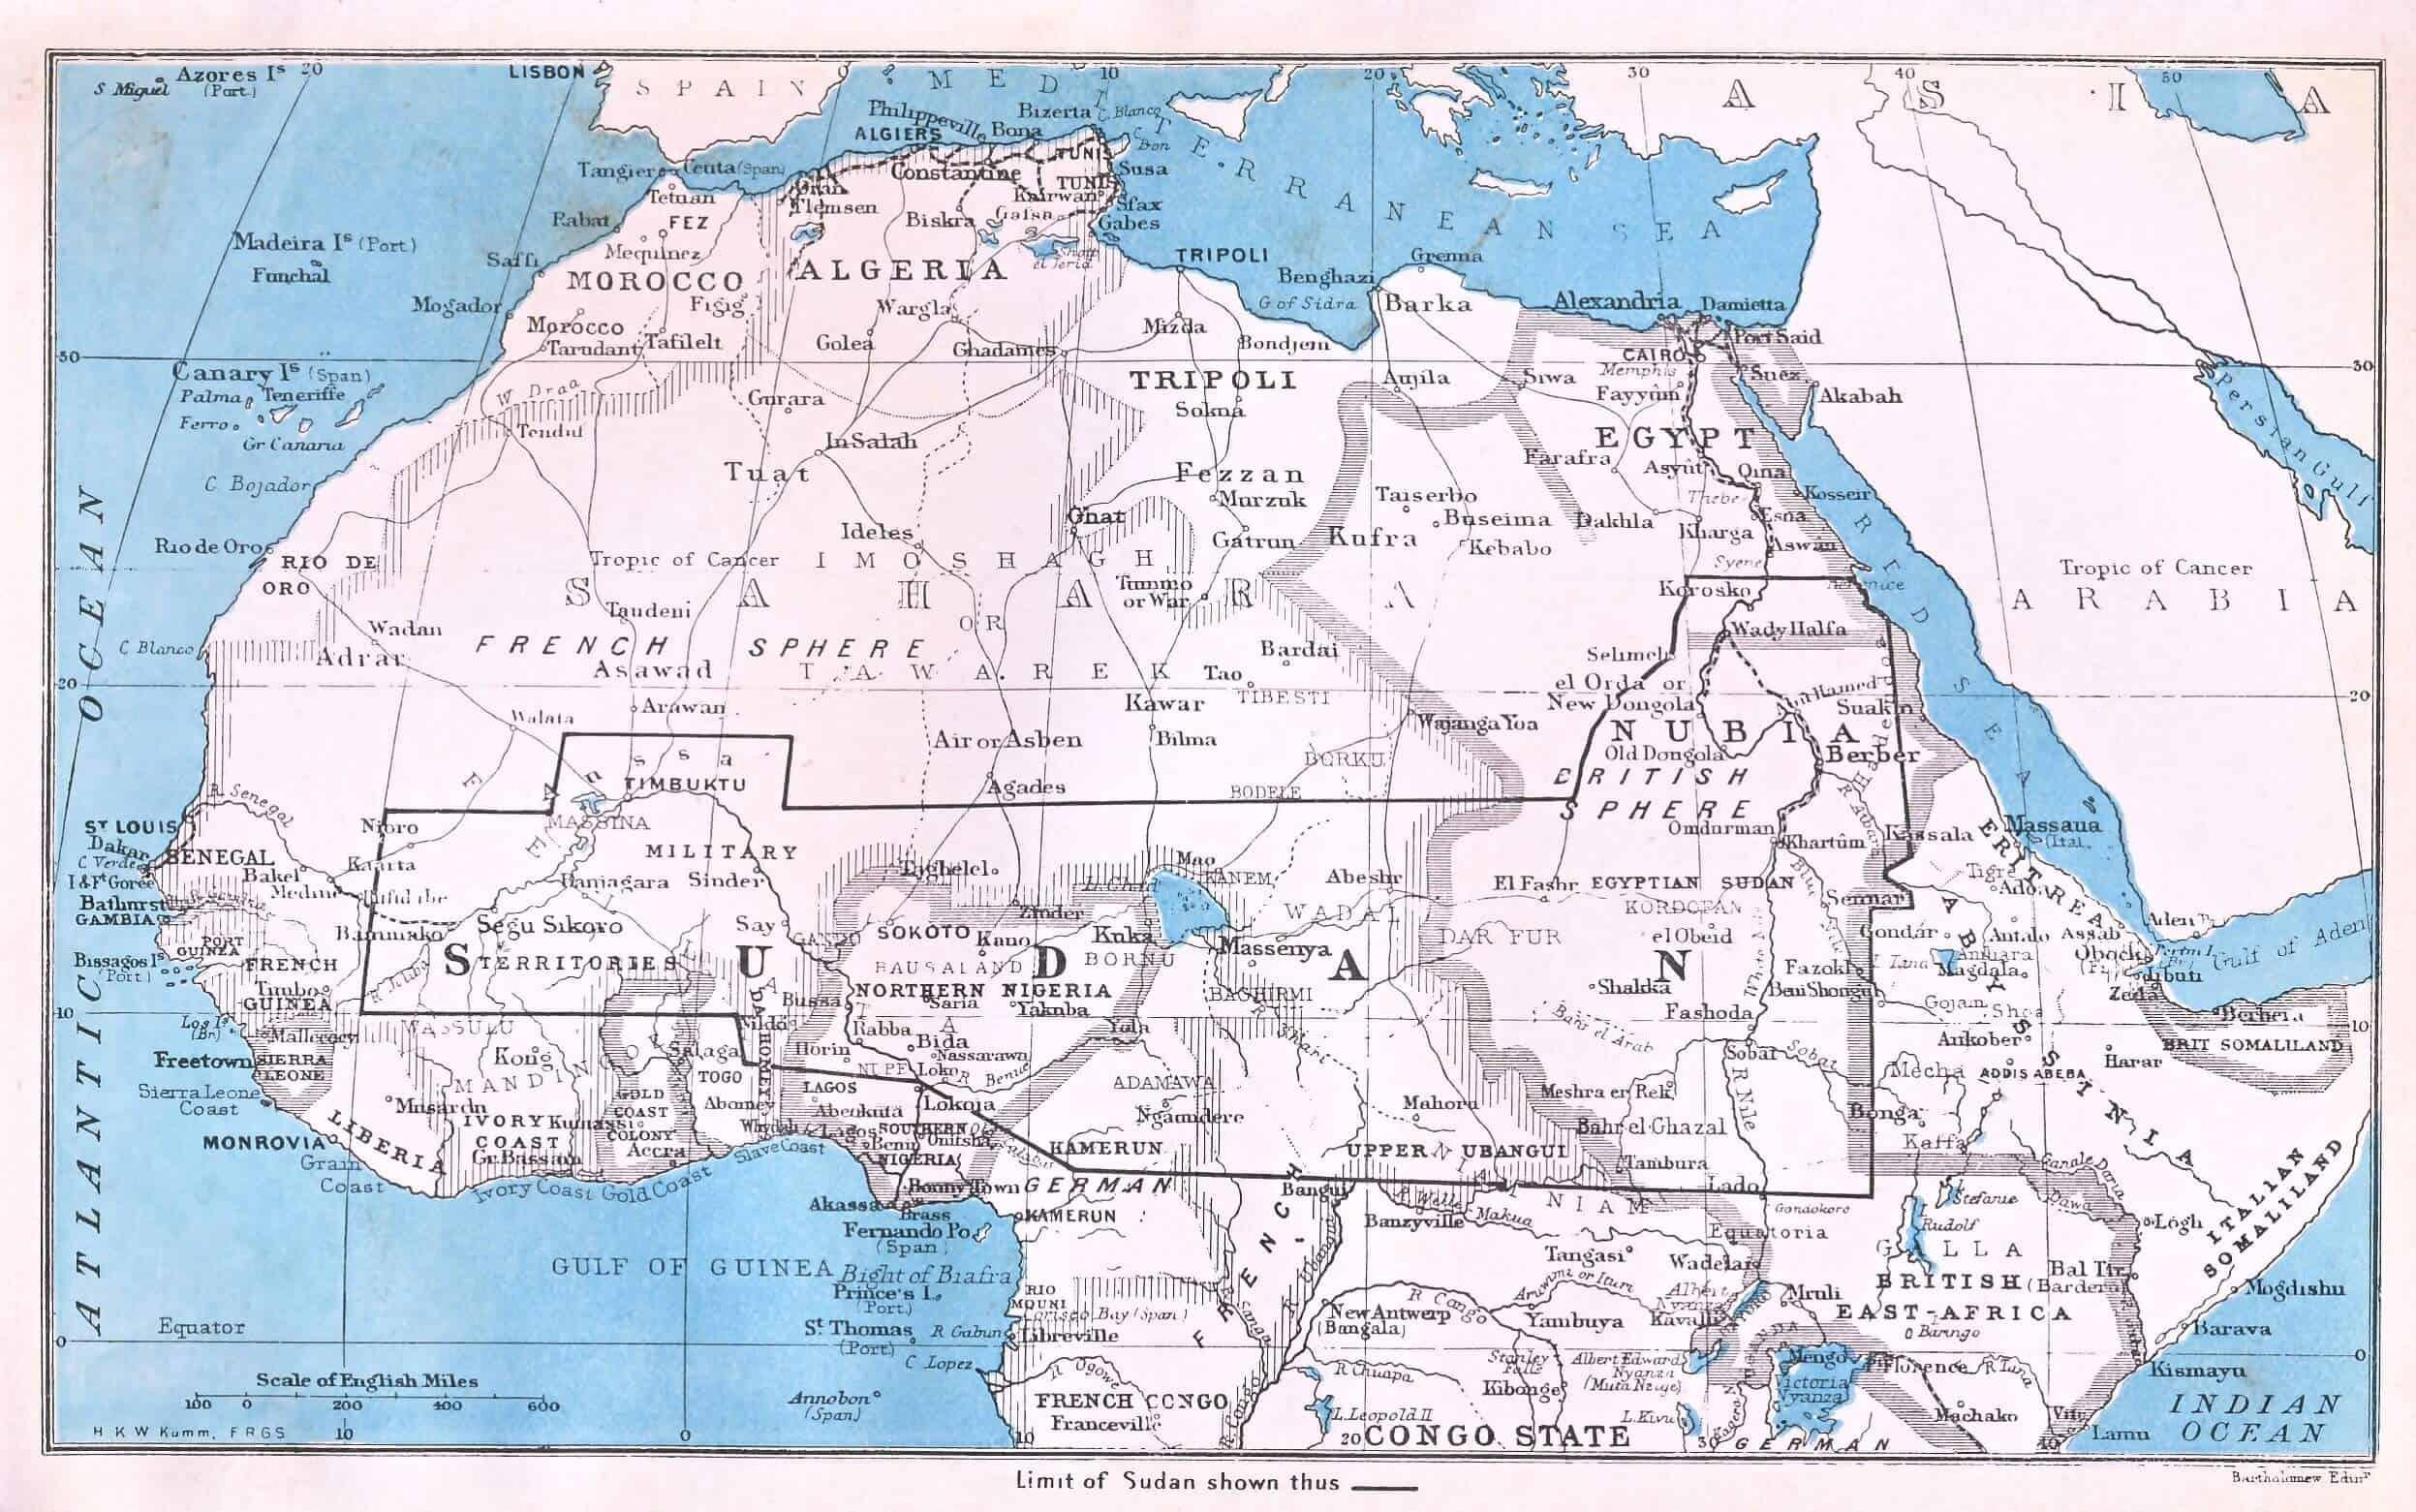 Sudan in the 1900's from Kumm, The Sudan, p.19.